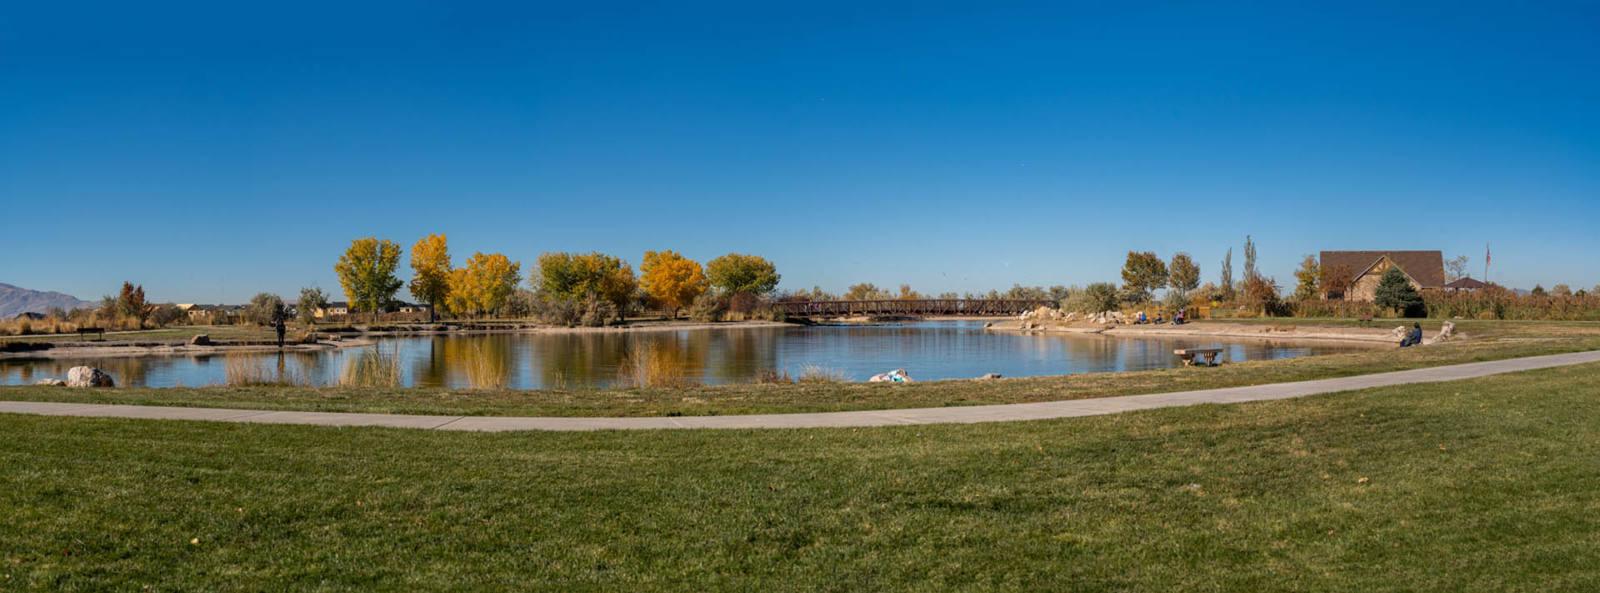 West Davis panoramic View of Wetlands